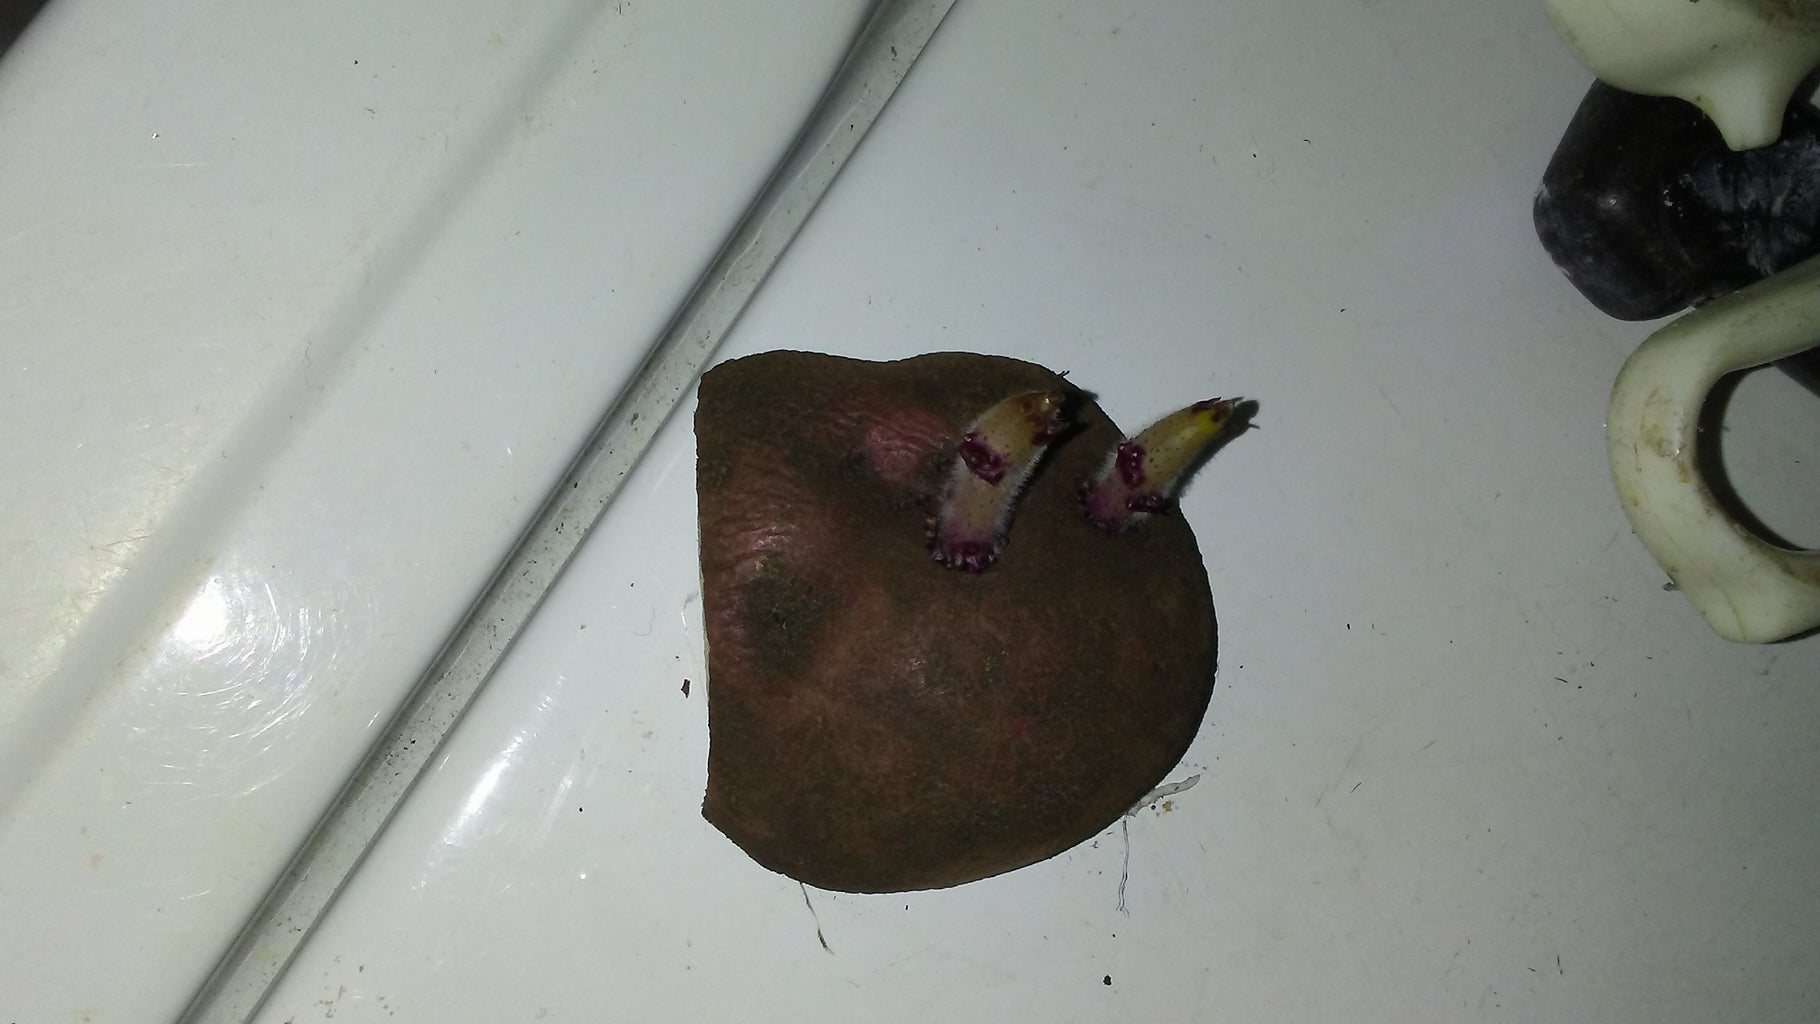 The Potato Cutting